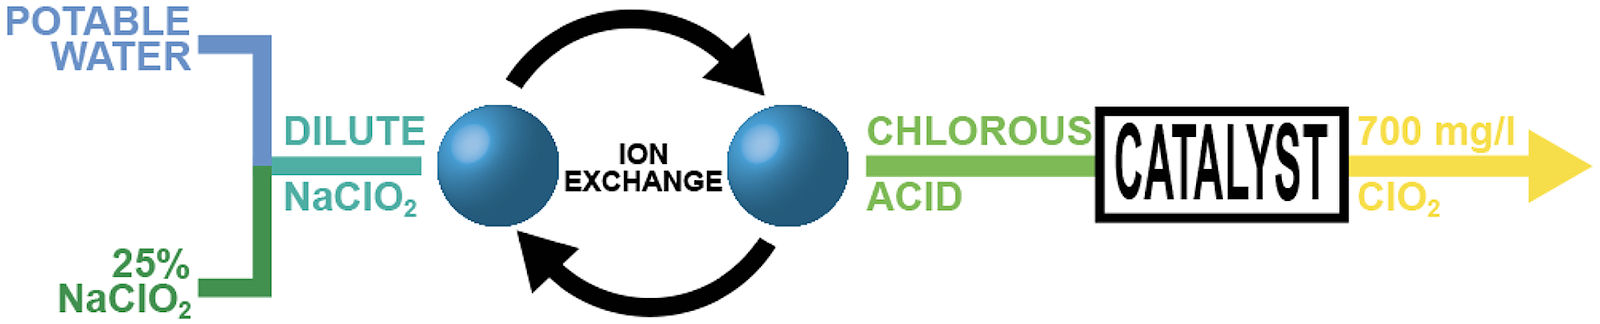 Catalytic Chlorine Dioxide diagram